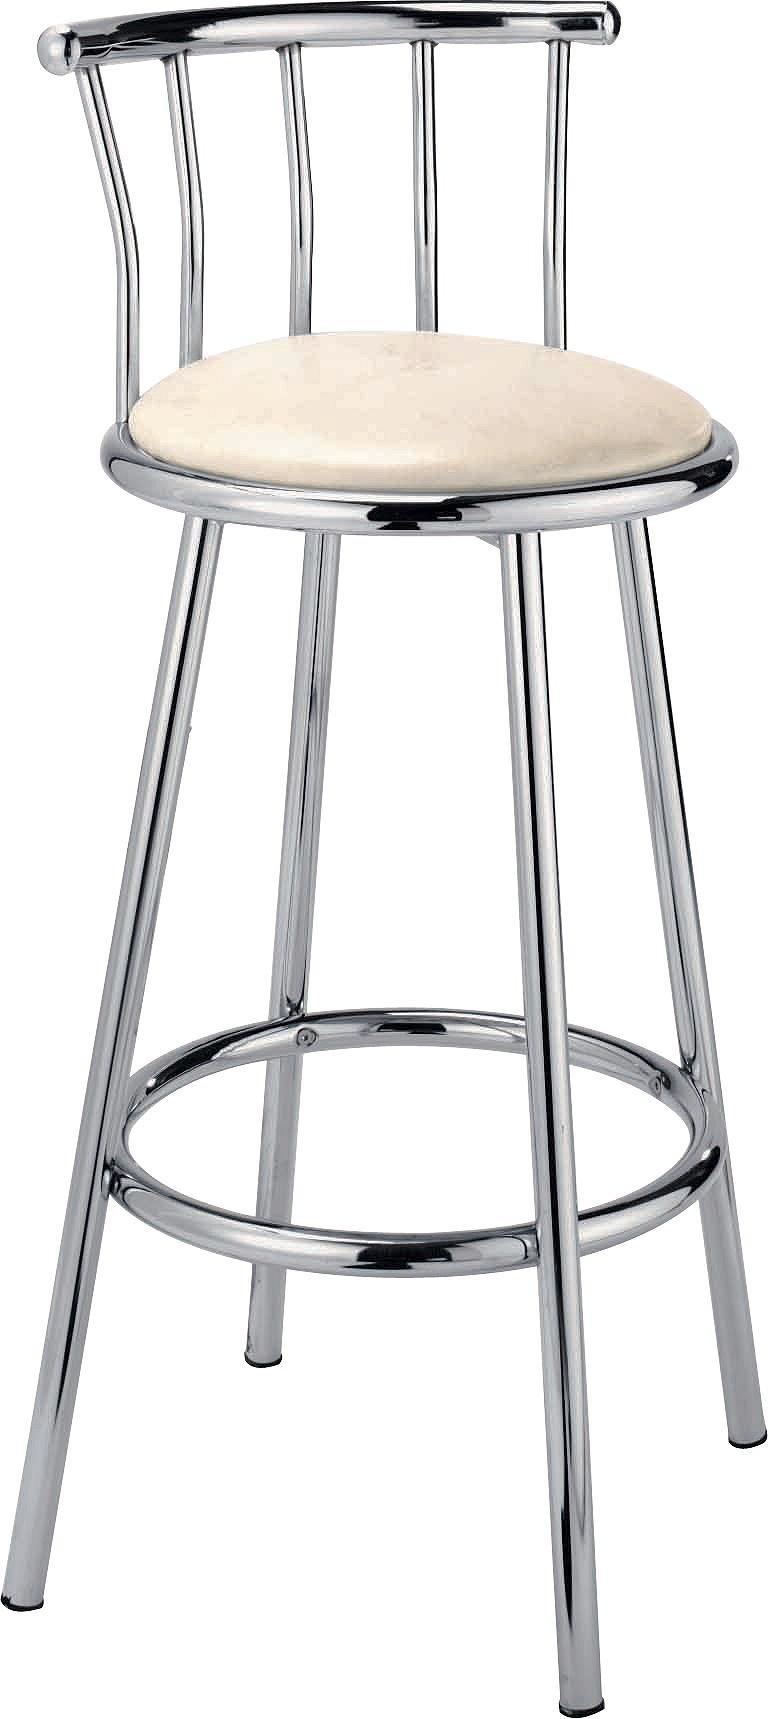 Buy HOME Gemini Cream Leather Effect Bar Stool at Argosco  : 6005054RZ001Webampw570amph513 from www.argos.co.uk size 570 x 513 jpeg 17kB